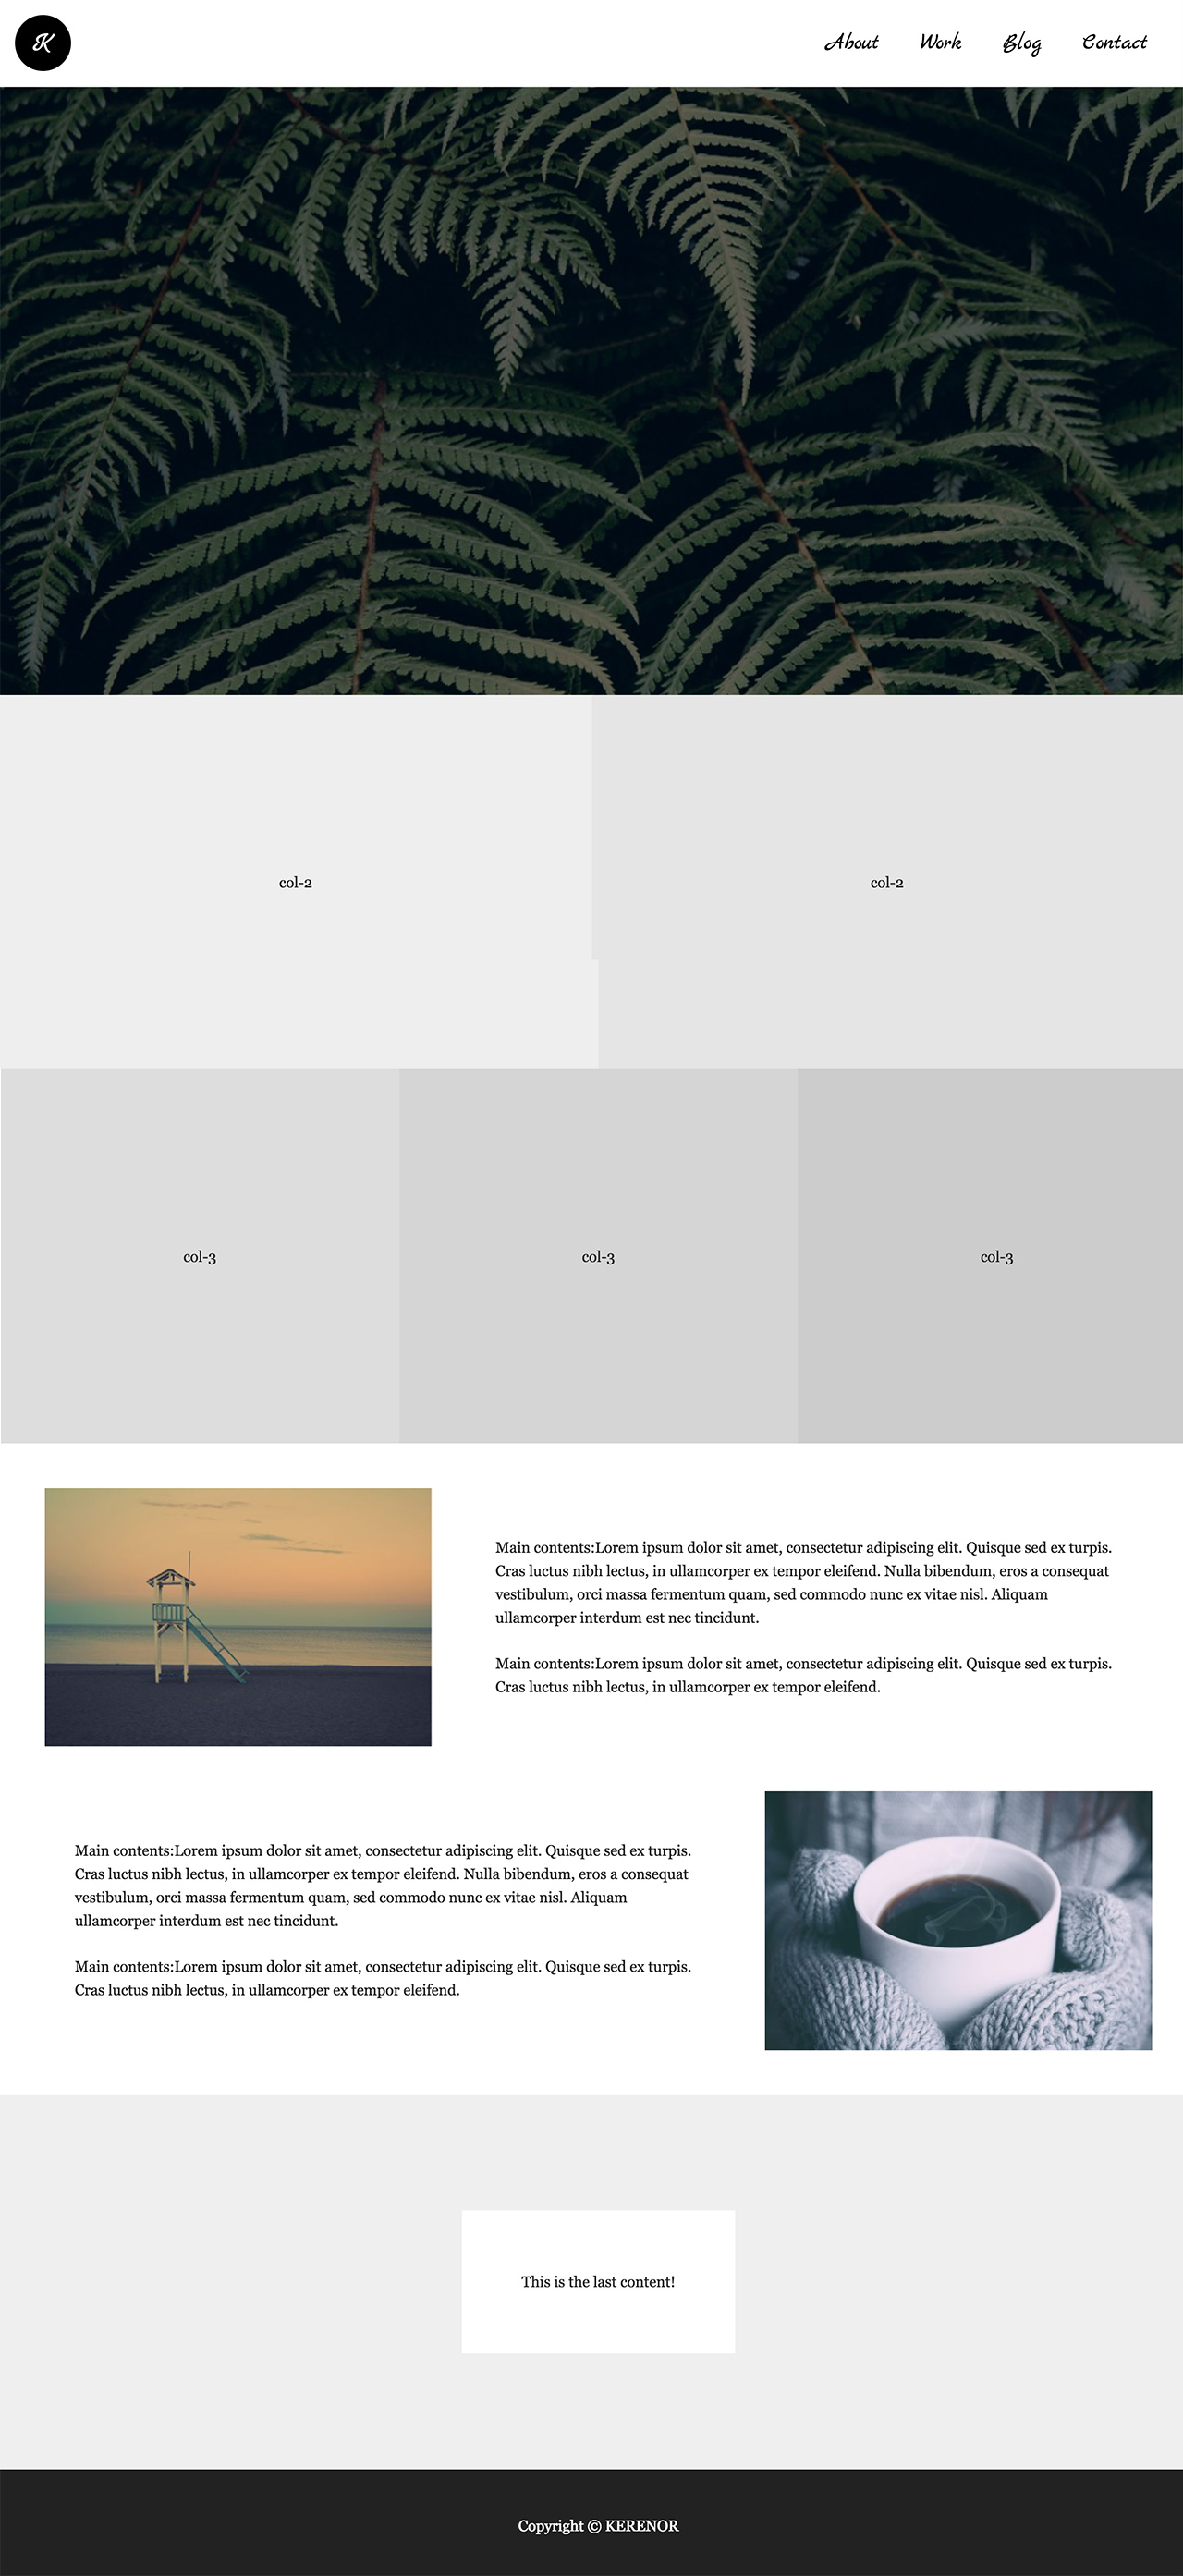 [CSS3] flexboxによるレスポンシブサイトの作り方 - シングルページ編(サンプル付き)